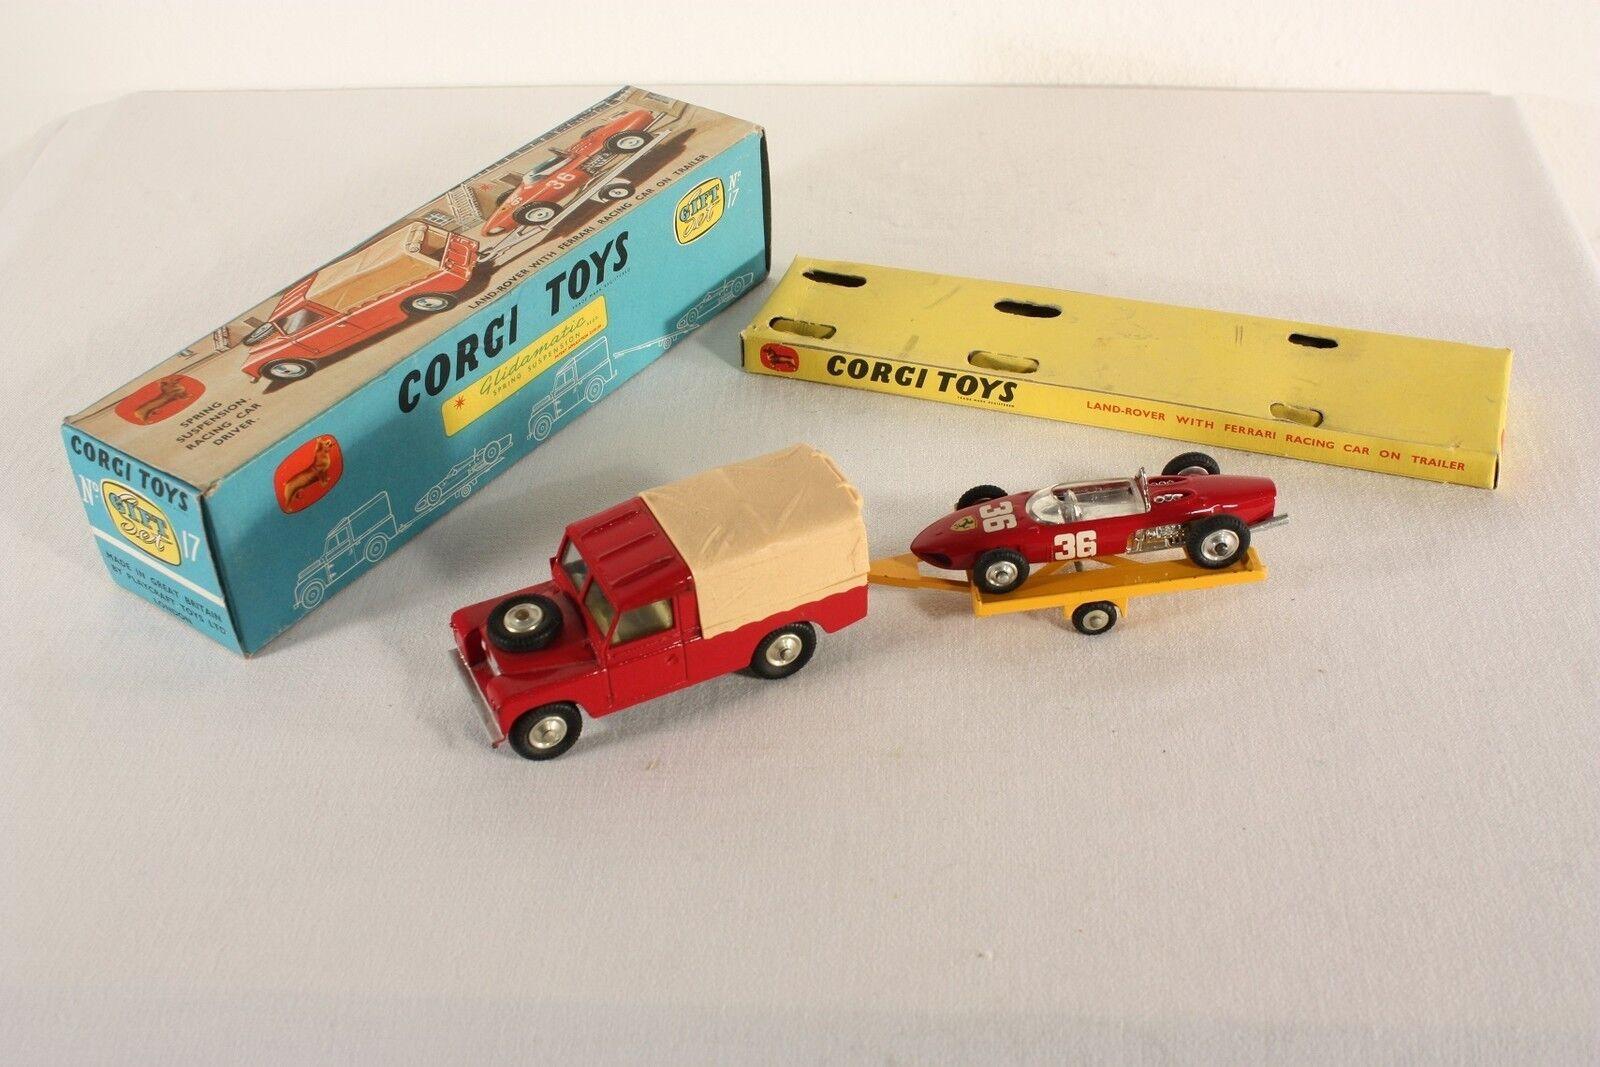 Corgi toys veneno set 17, país-Rover with Ferrari Racing Car, Mint en Box  ab666